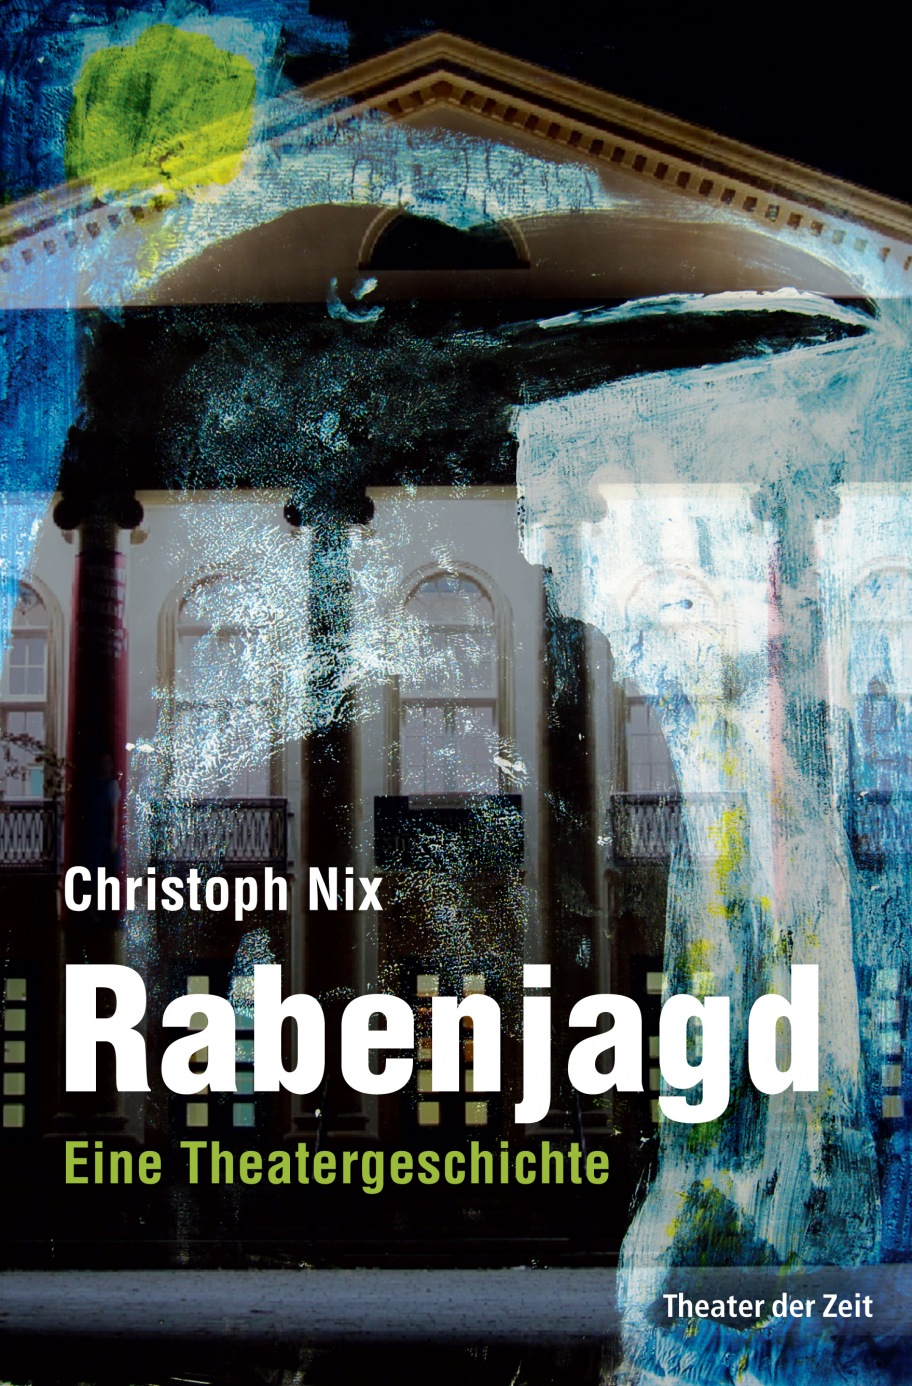 Christoph Nix: Rabenjagd